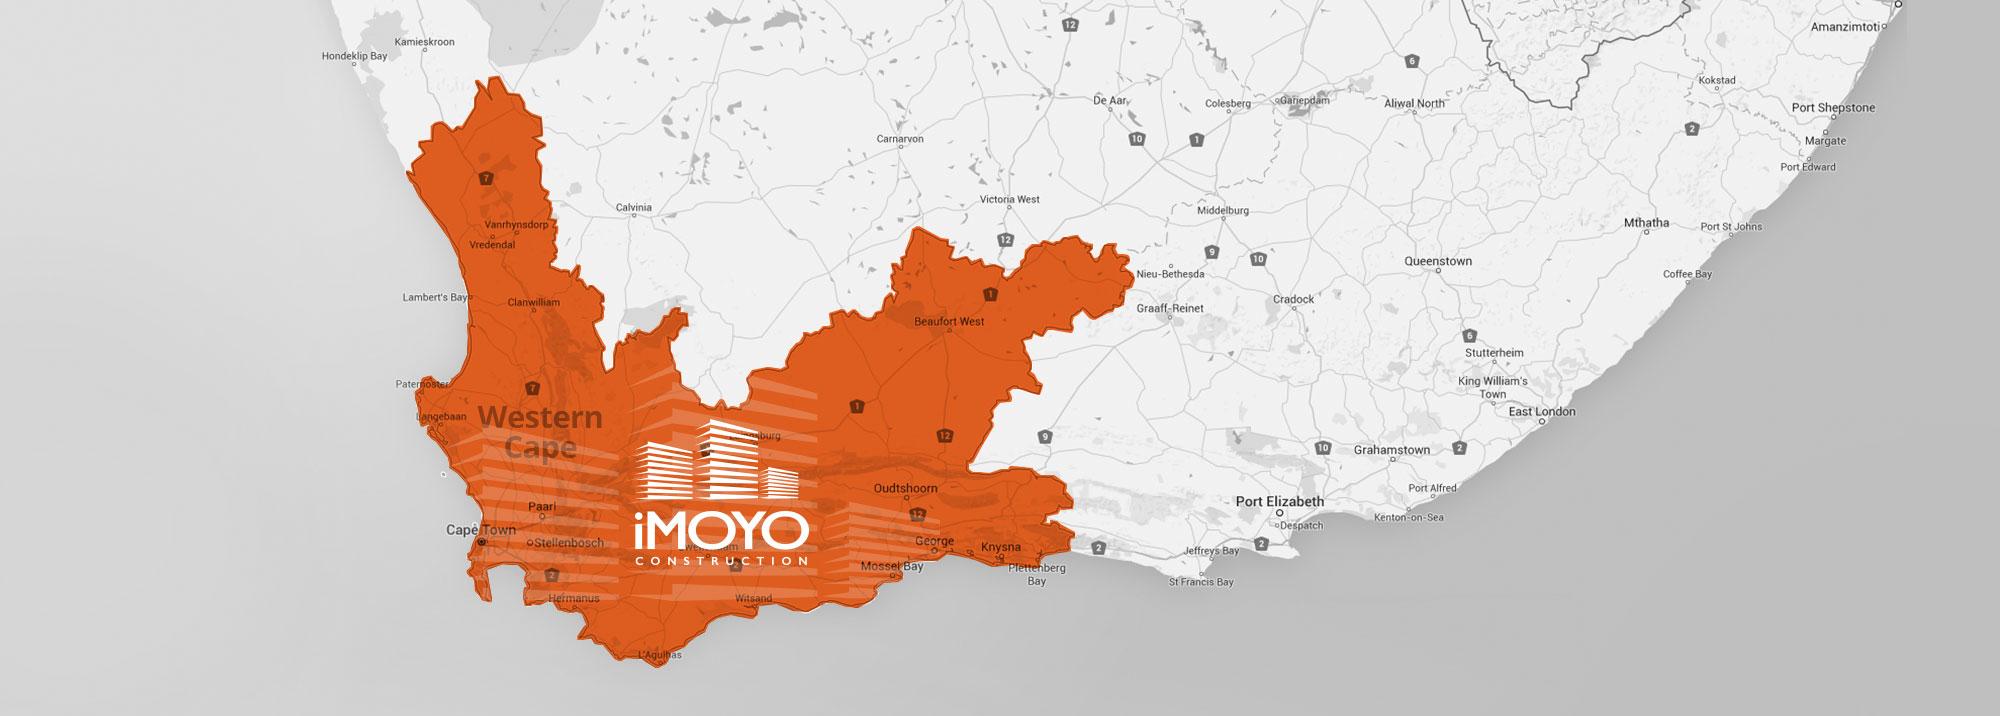 iMoyo-Map